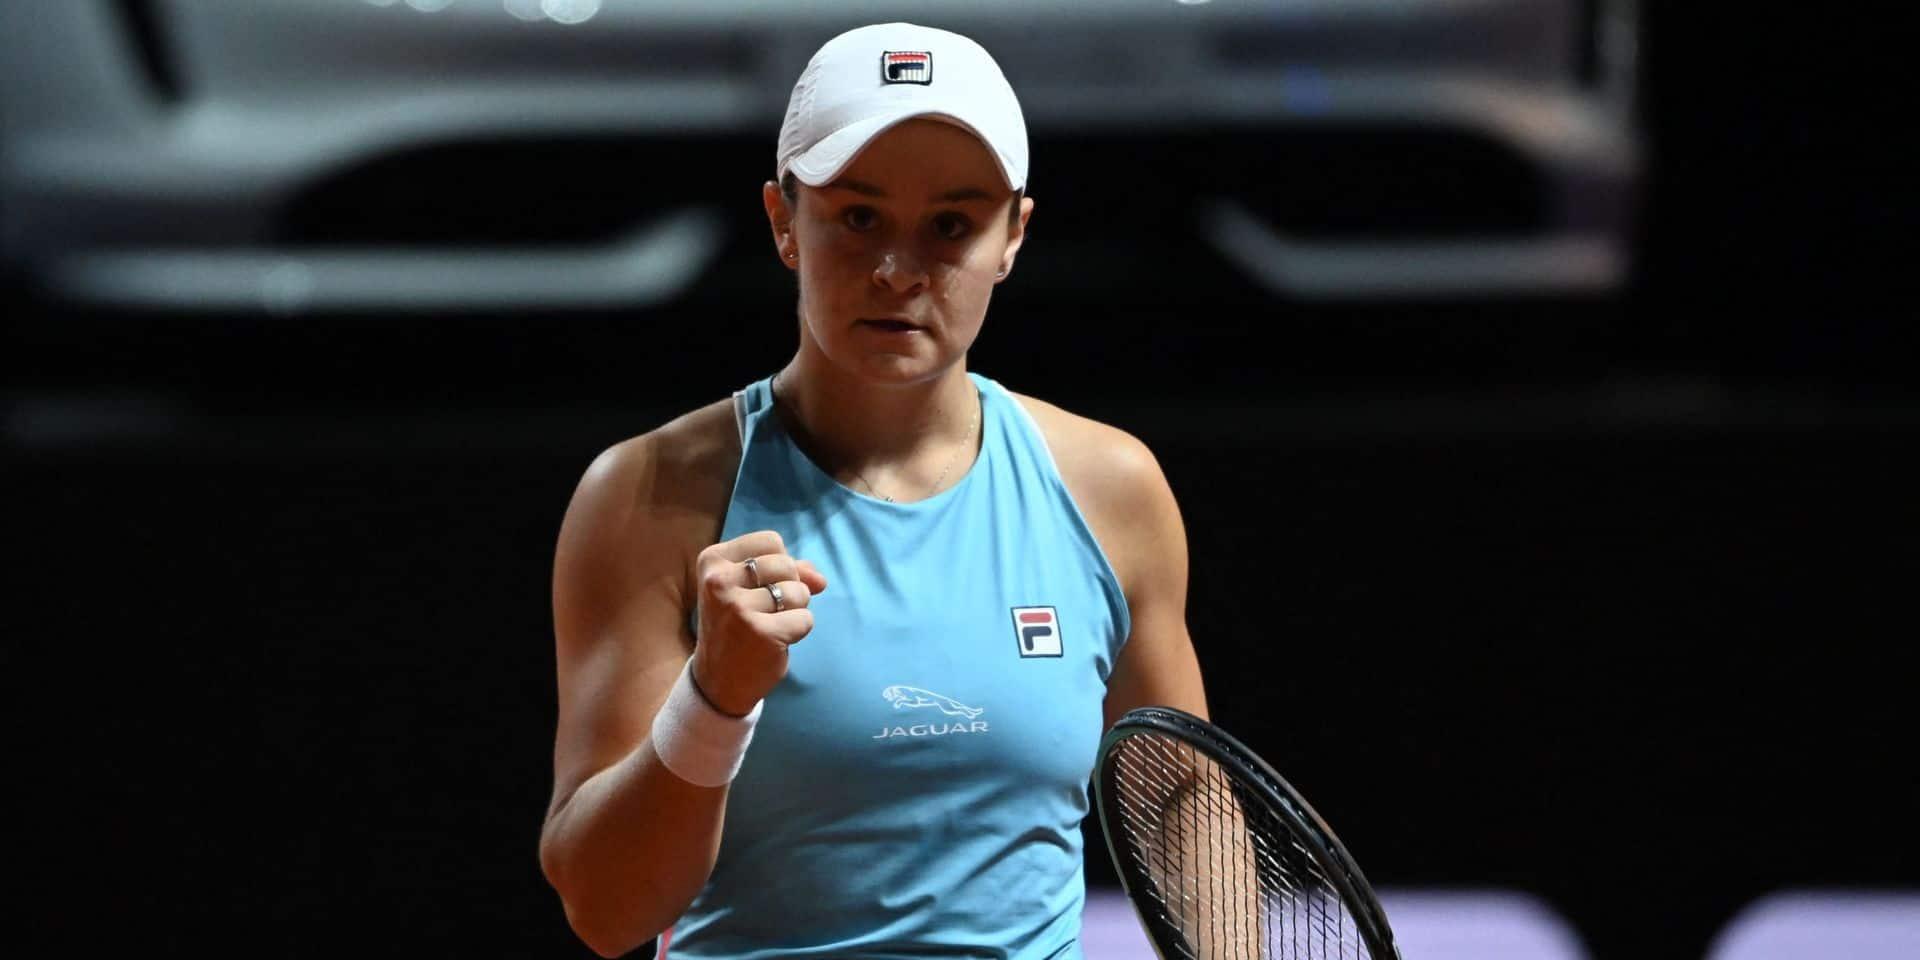 WTA Stuttgart : Ashleigh Barty bat Aryna Sabalenka en finale et enlève son 11e titre